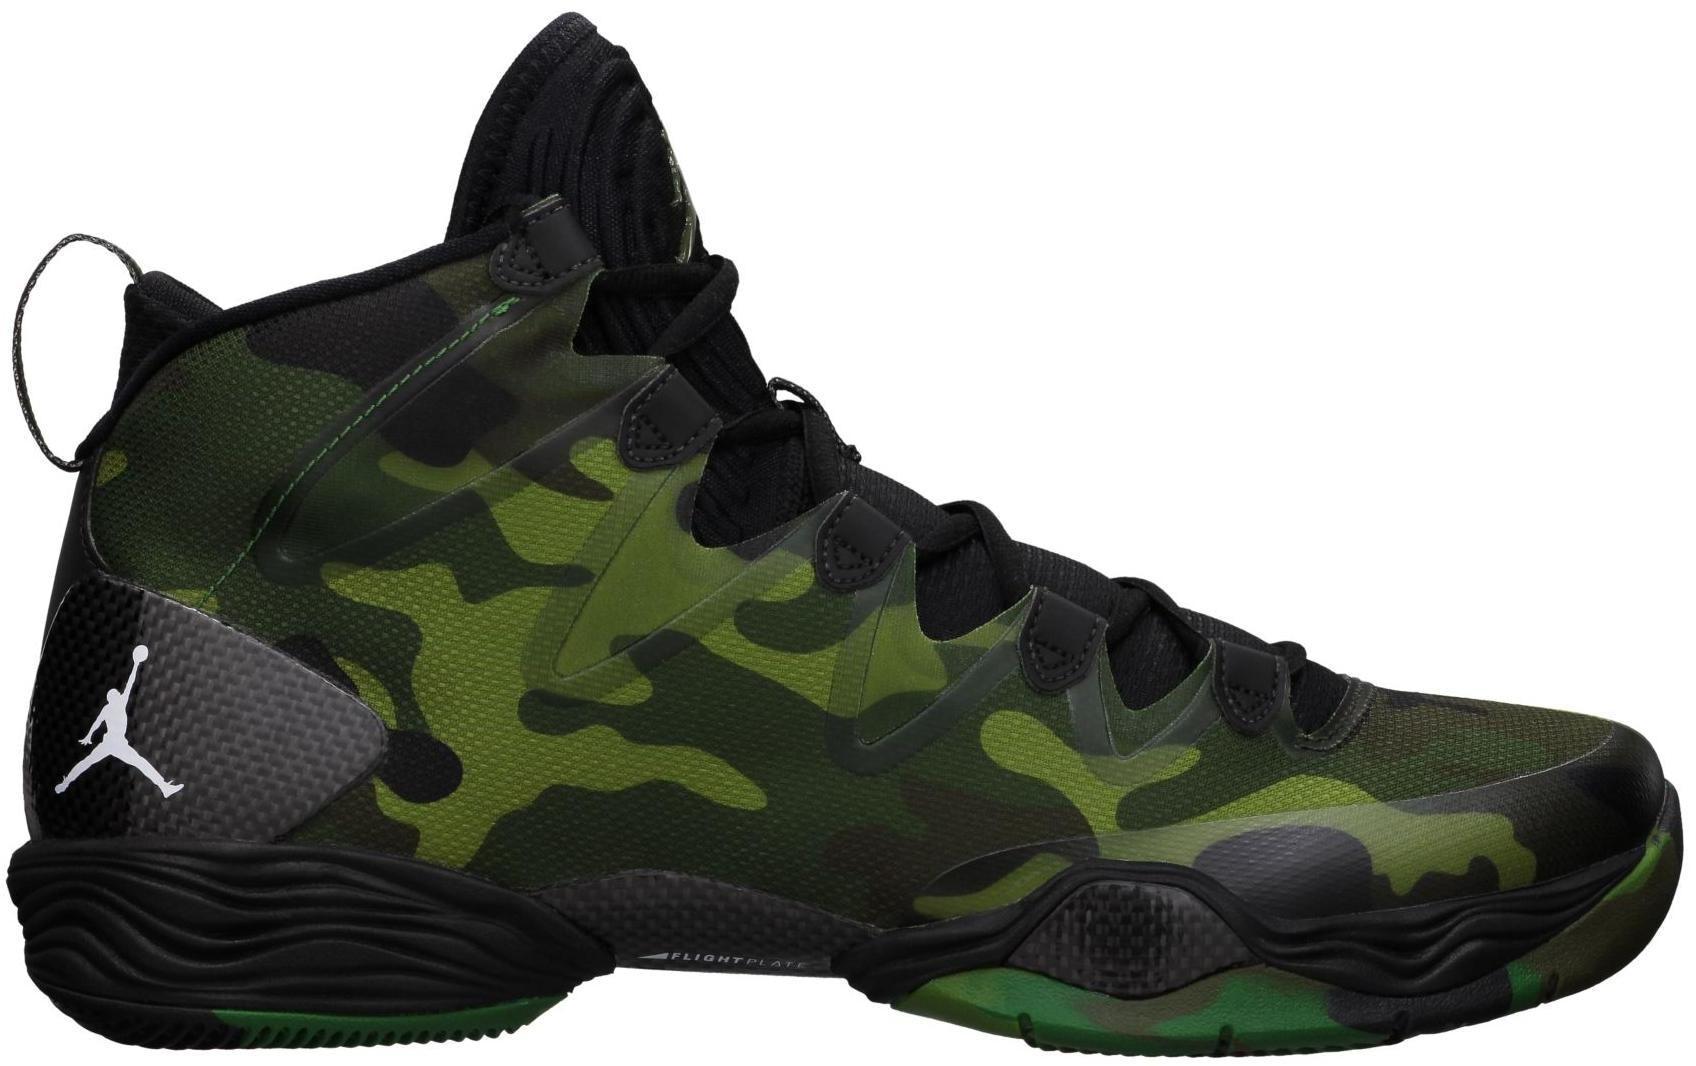 Jordan XX8 SE Green Camo